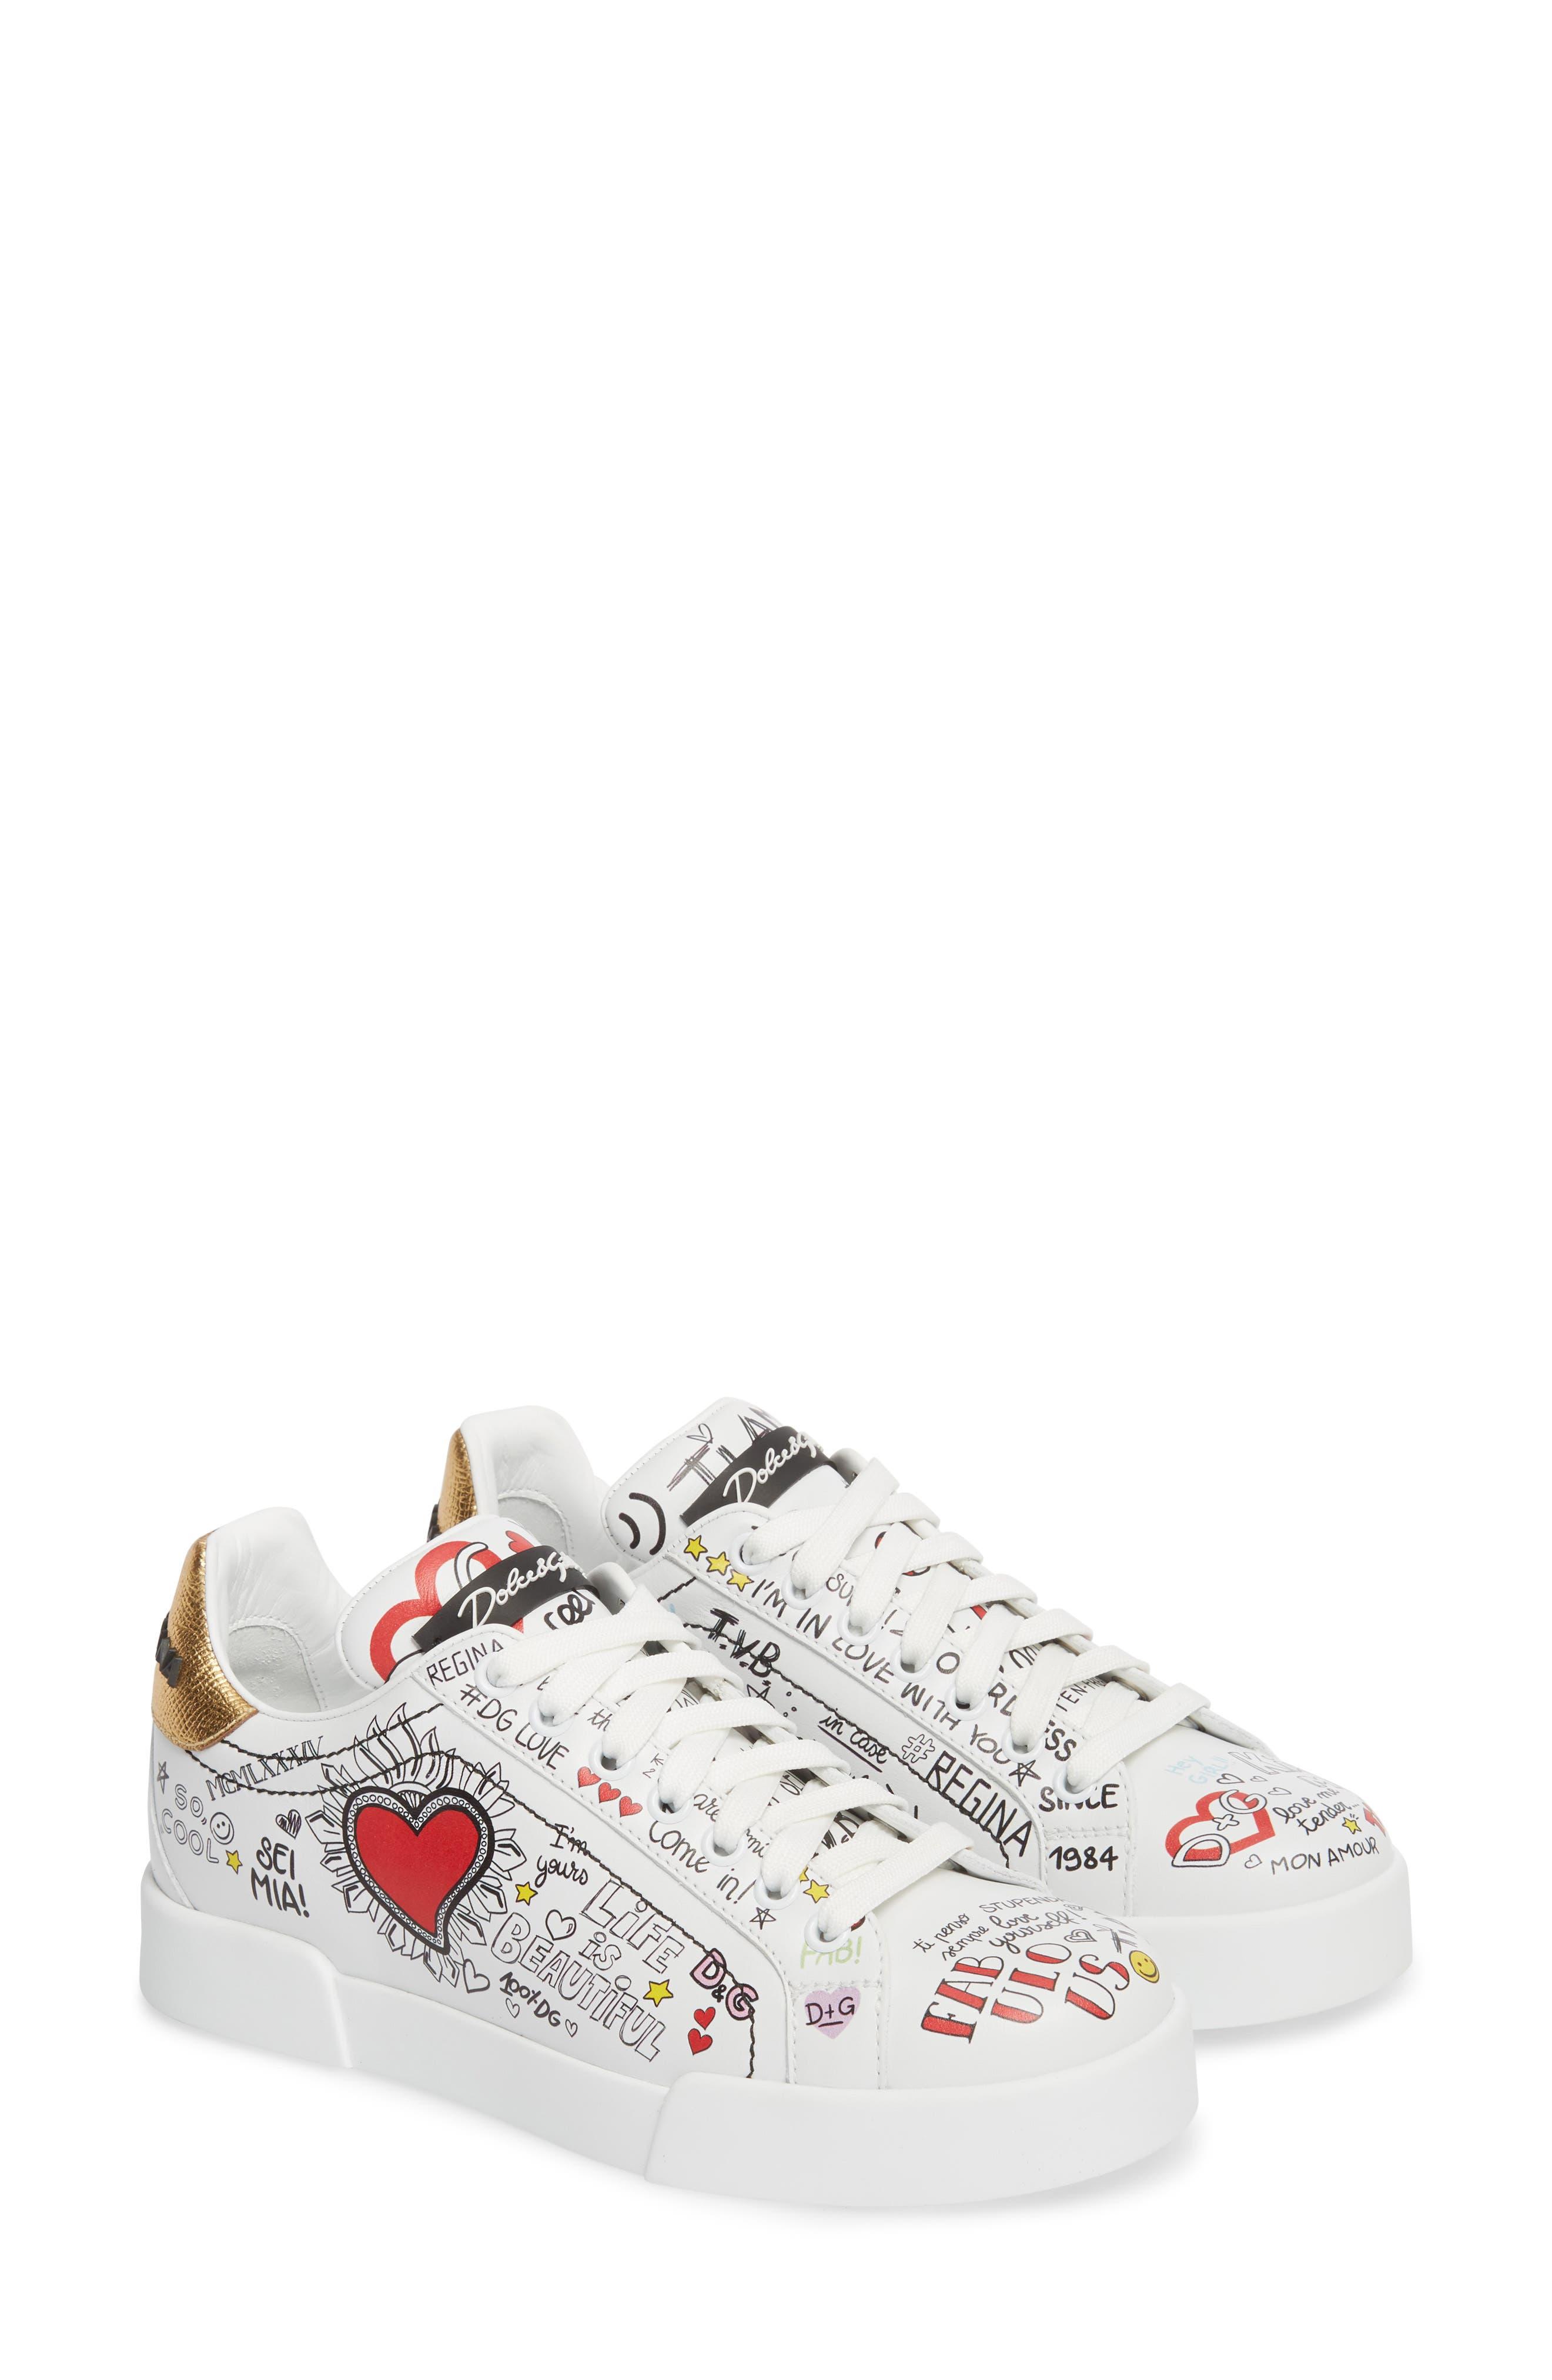 Graffiti Sneaker,                             Alternate thumbnail 2, color,                             White